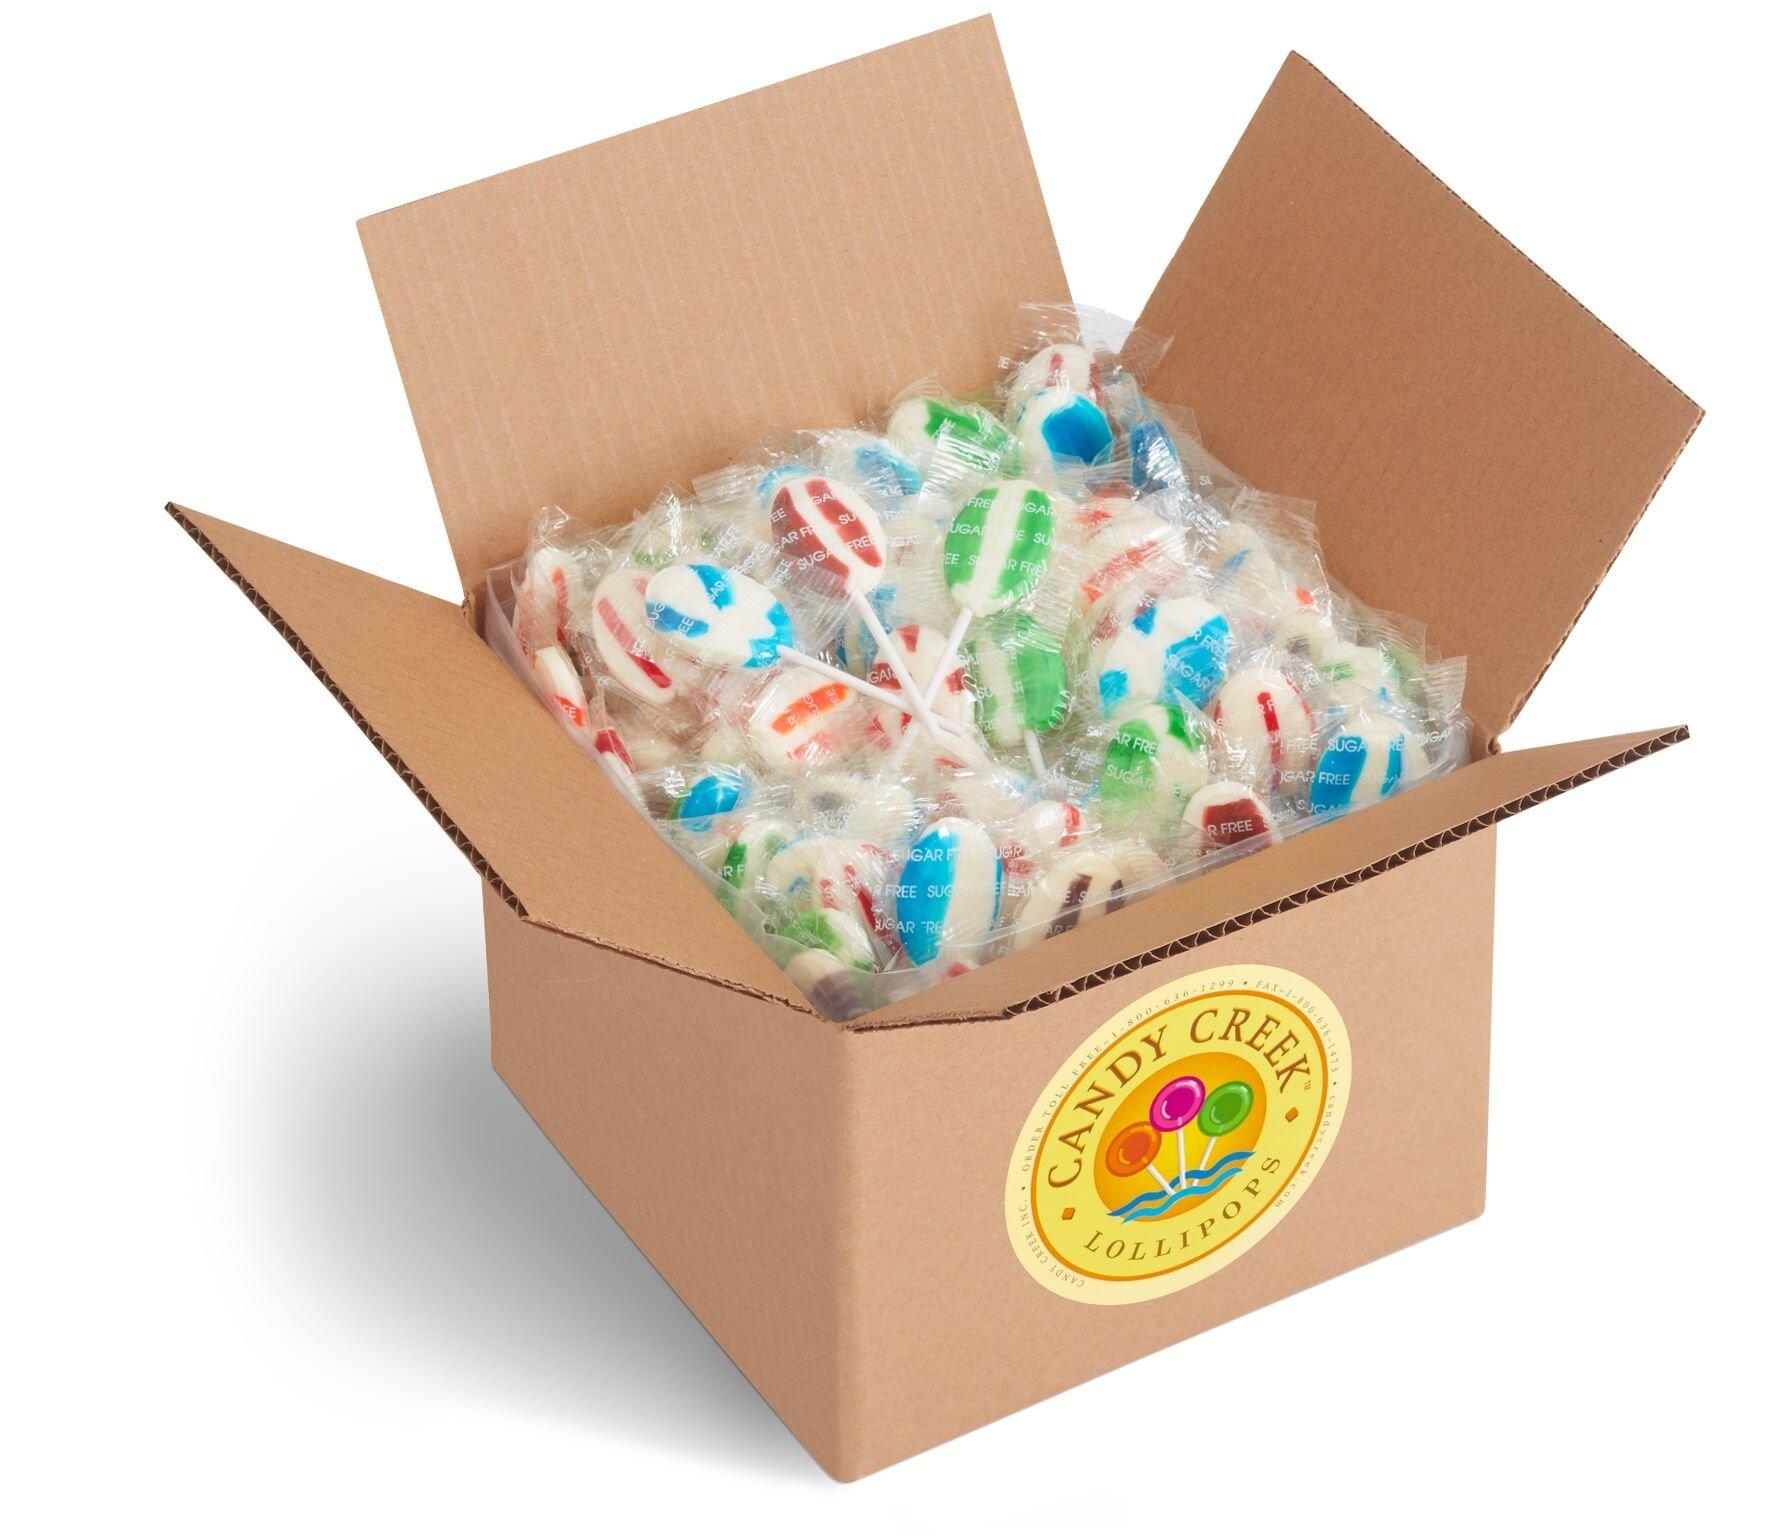 Oval Sugar Free Fruit Zany Lollipops by Candy Creek, Bulk 4 lb. Carton, Assorted Flavors by Candy Creek Lollipops